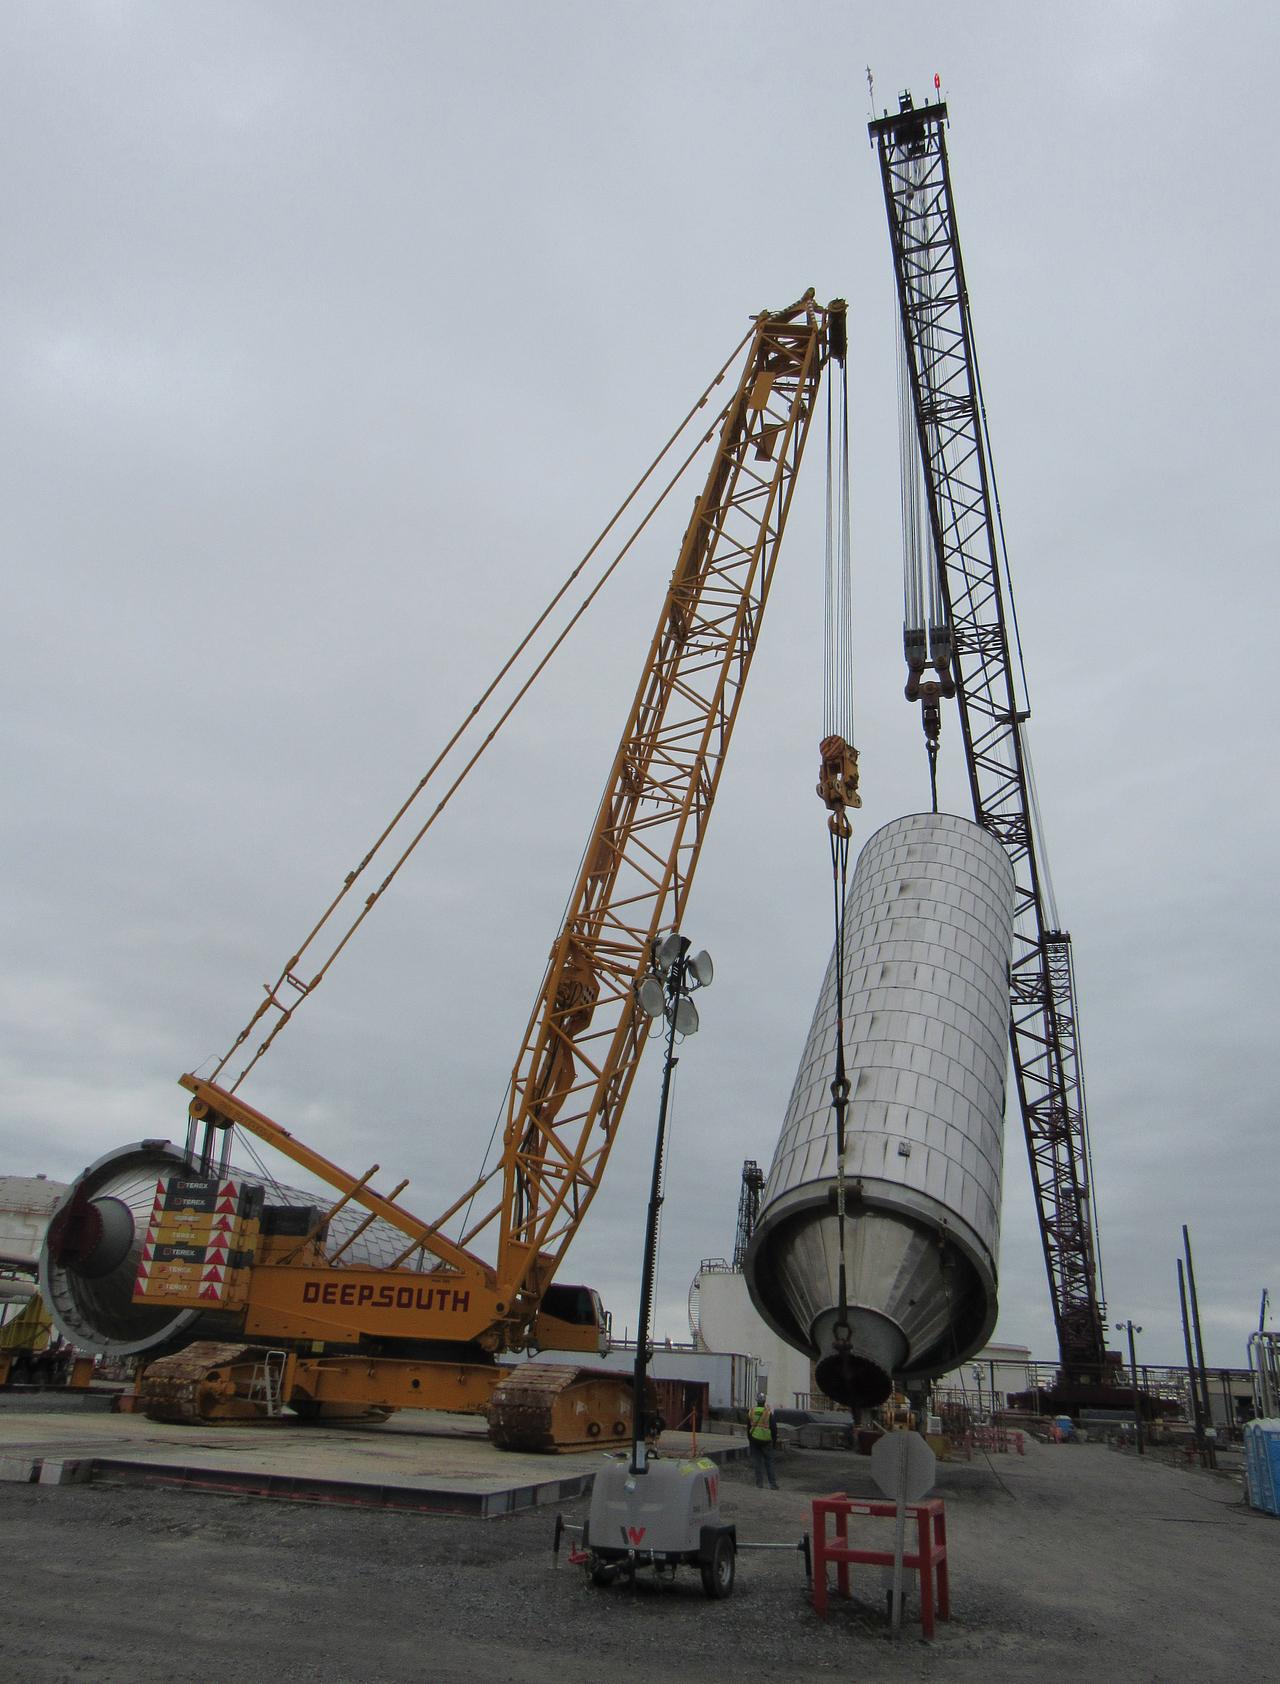 Crane lifting heavy coke drum